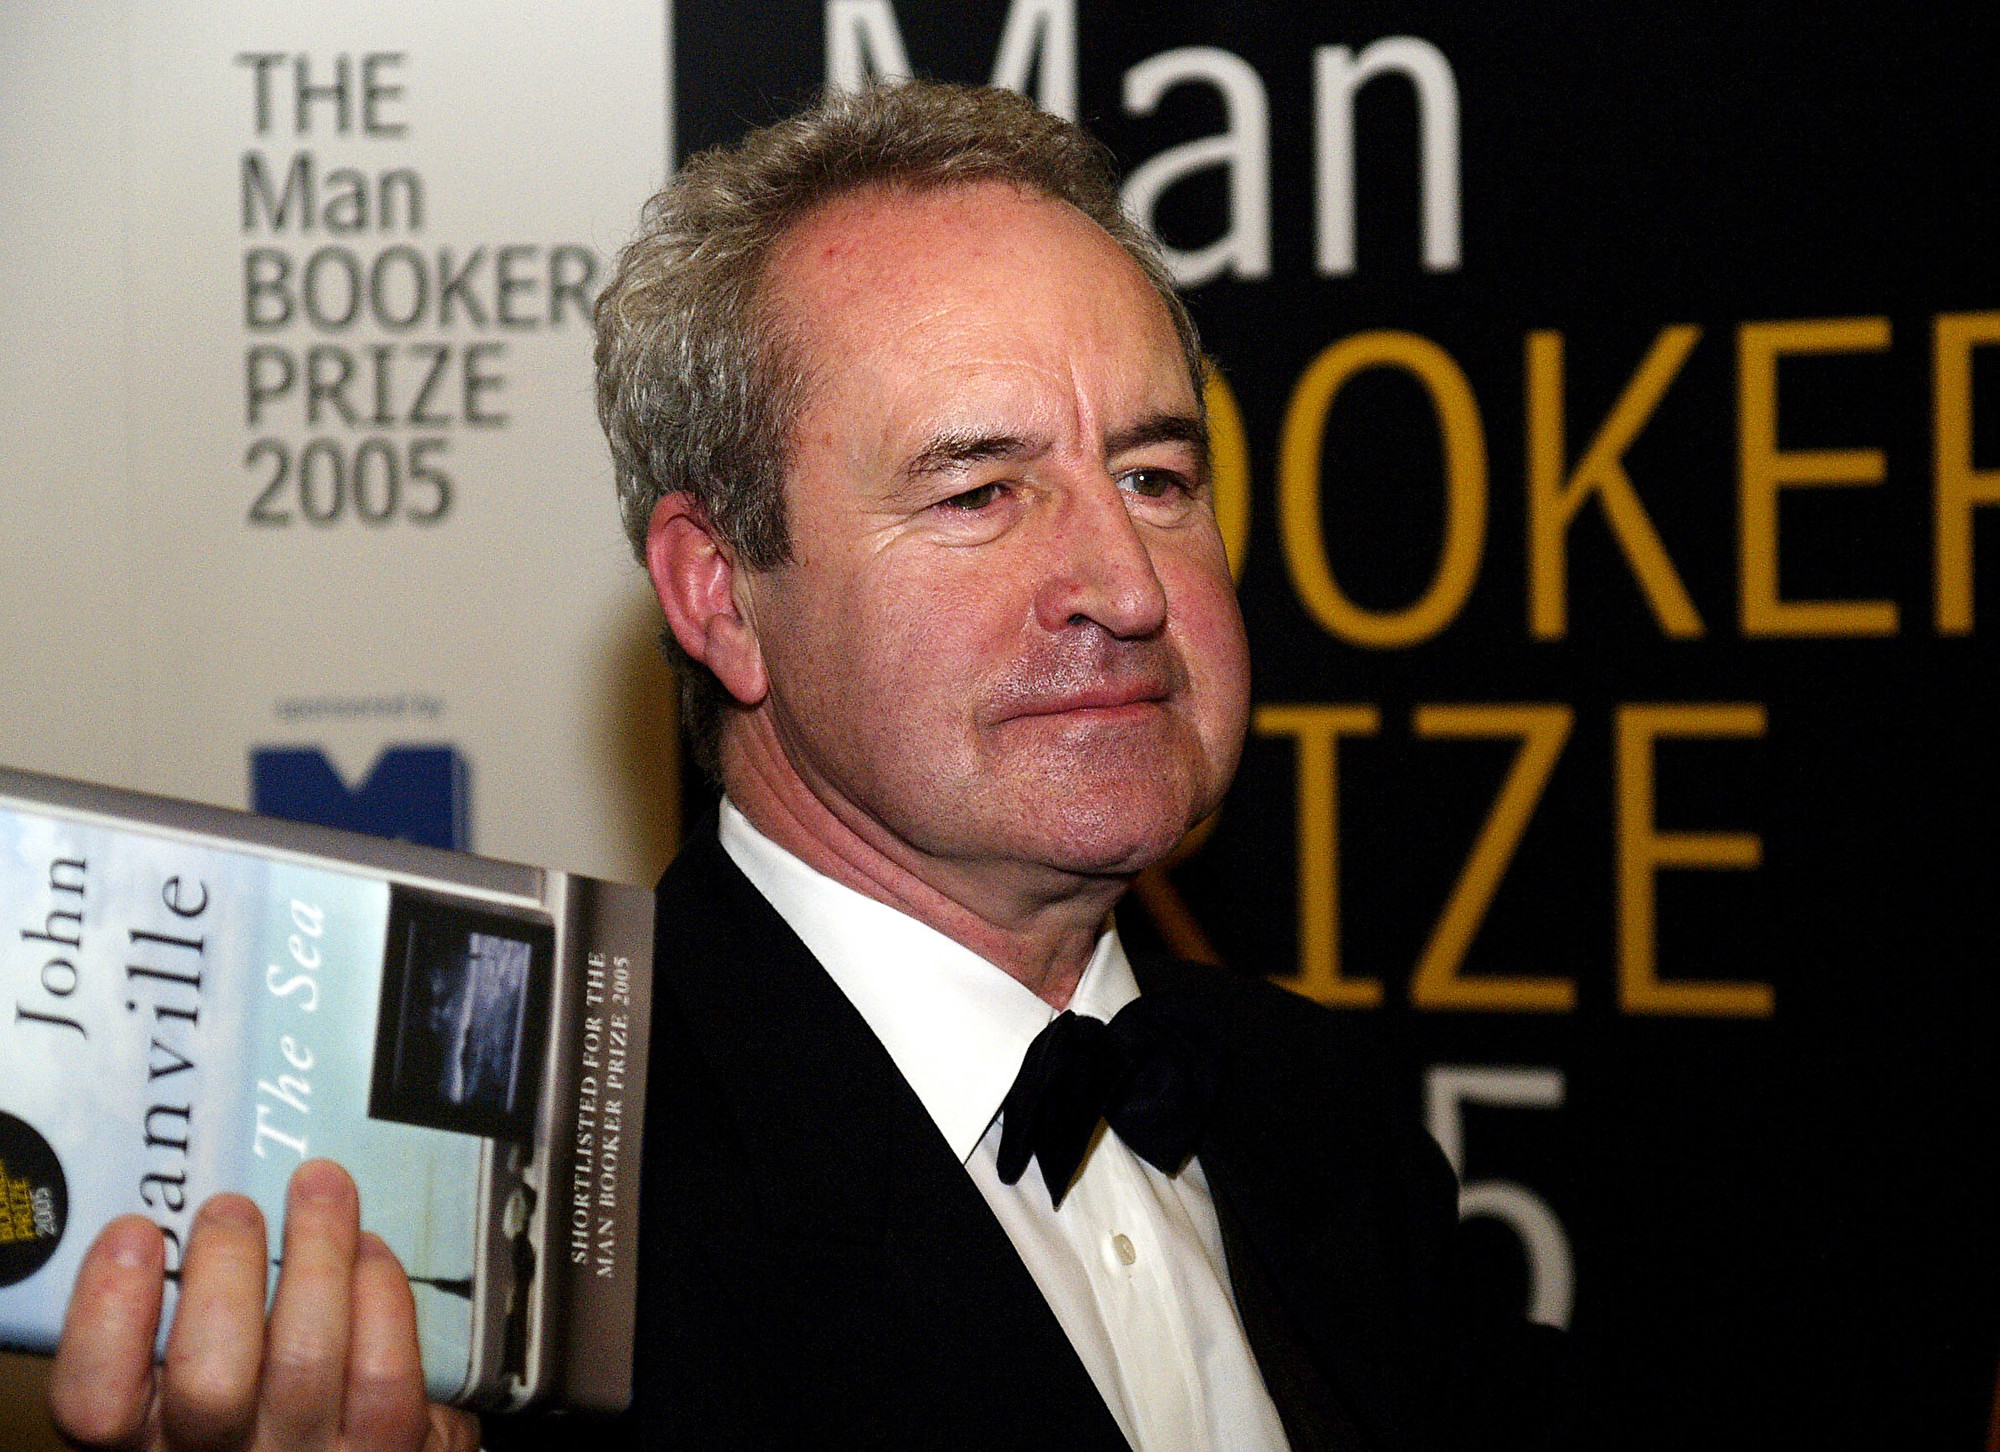 愛爾蘭名作家約翰·班維爾(John Banville)曾於2005年獲得布克獎(Booker Prize)。(MAX NASH / AFP)